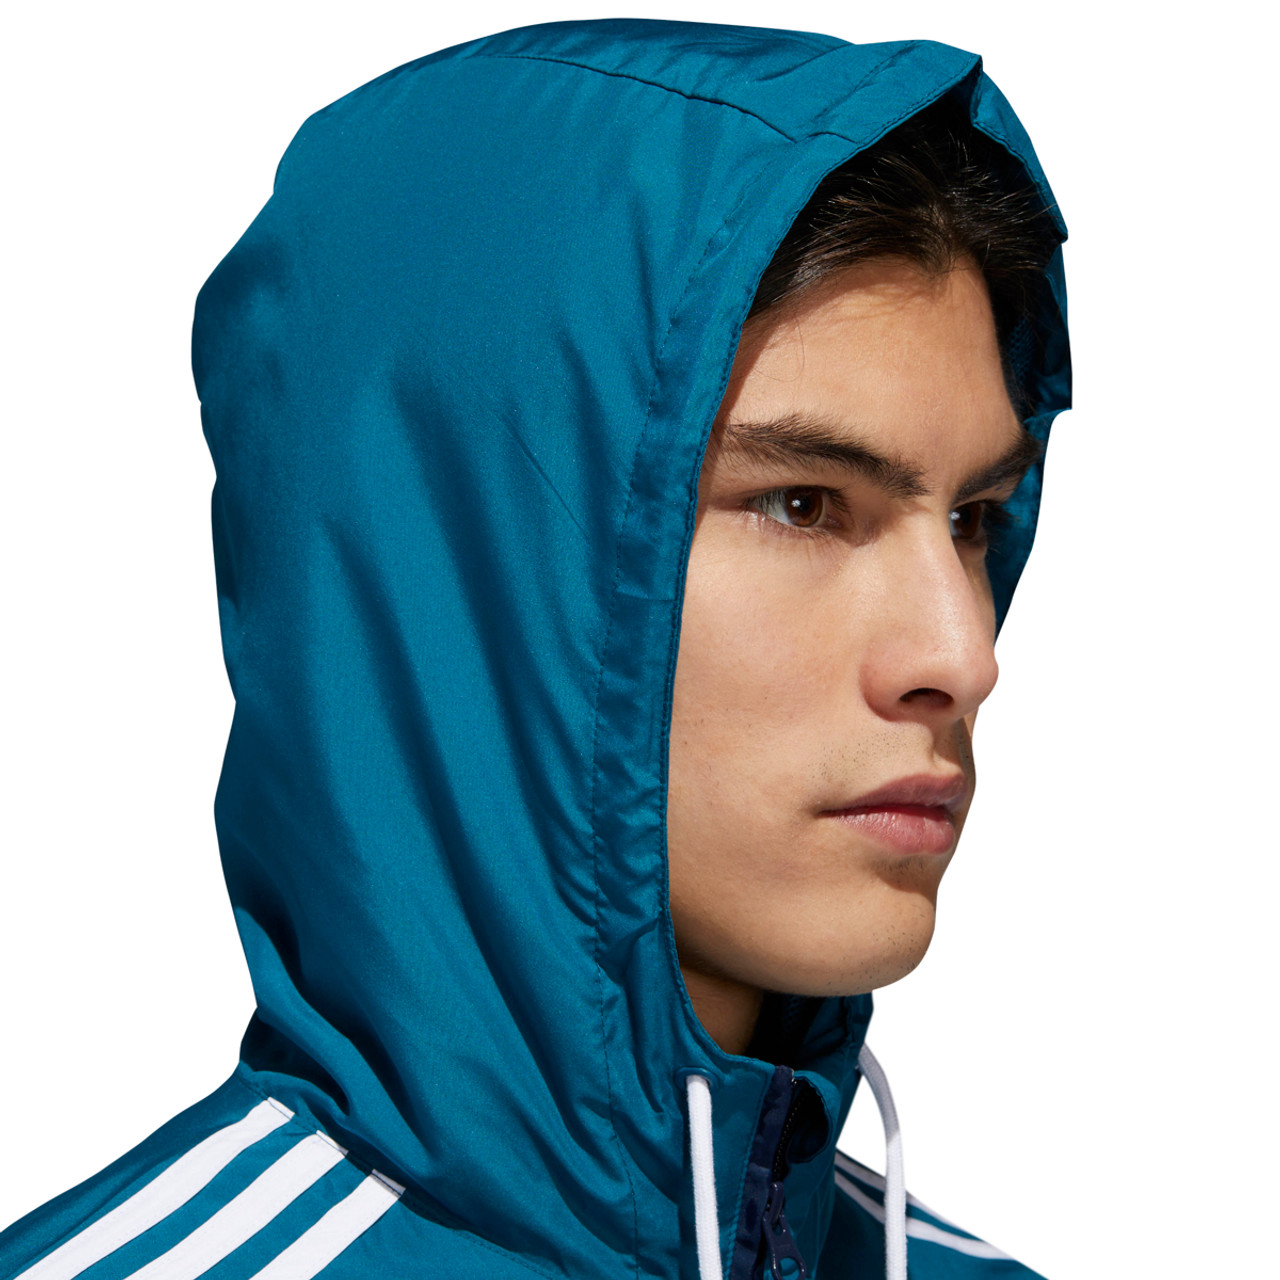 2dab84c61 Adidas Premier Windbreaker Jacket Mens Teal Navy | Boardparadise.com